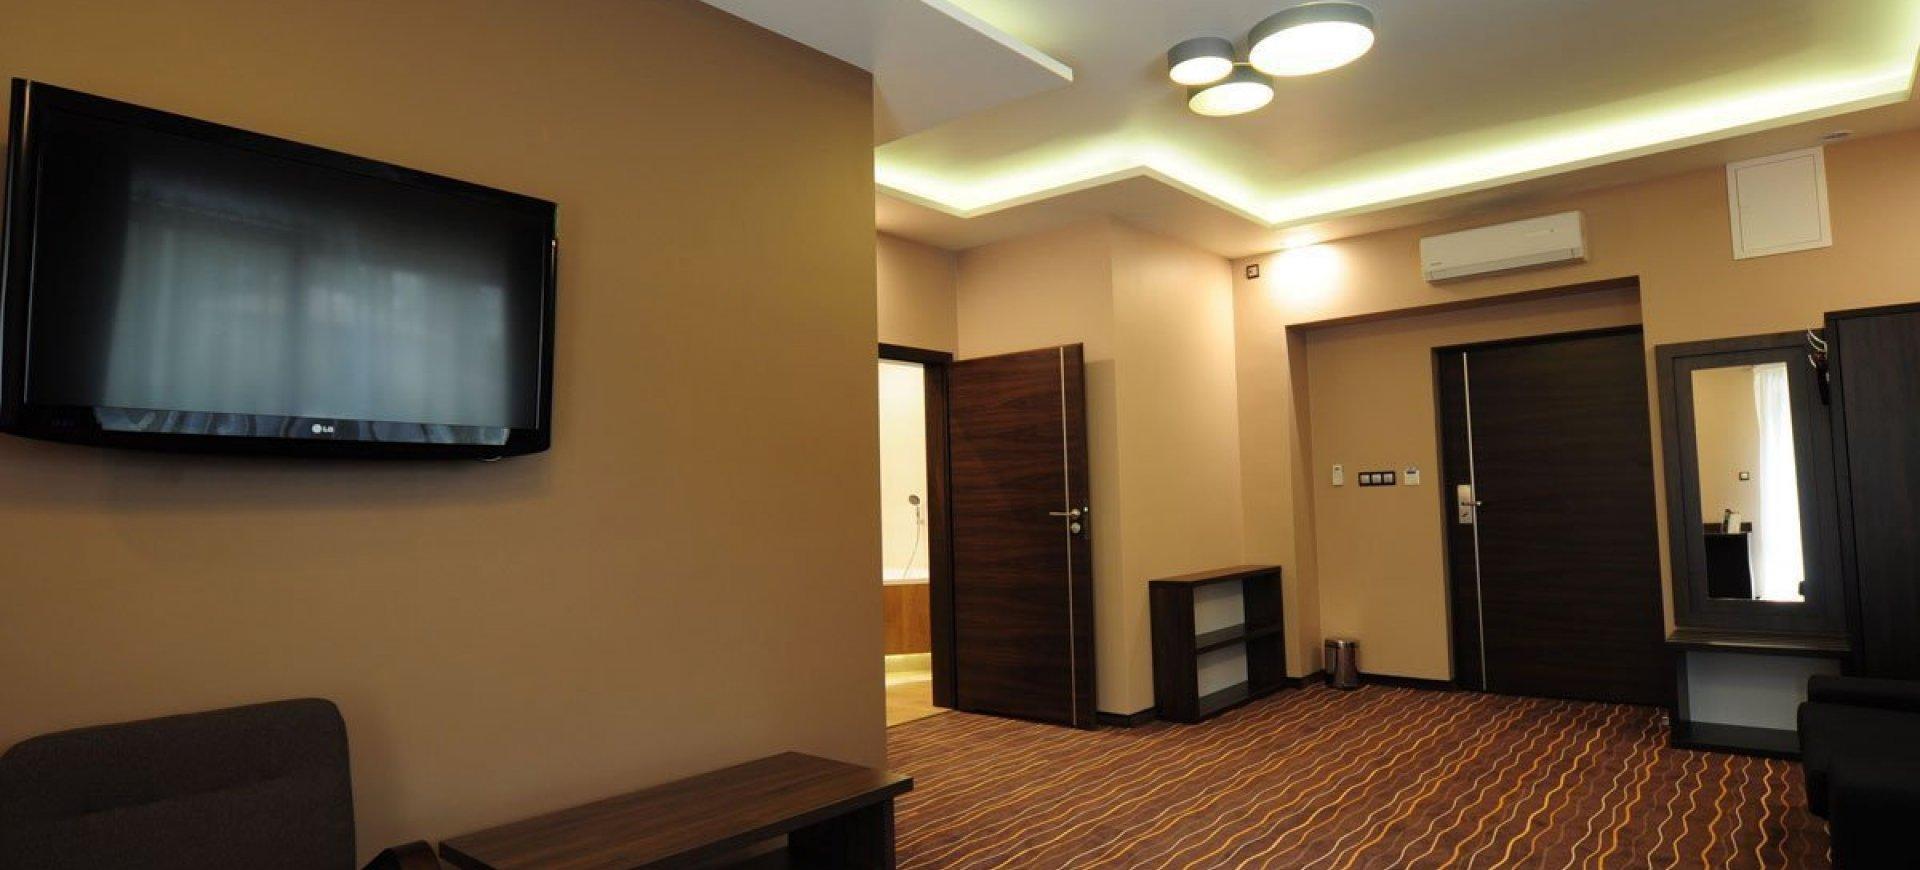 Apartament - kategoria 4*